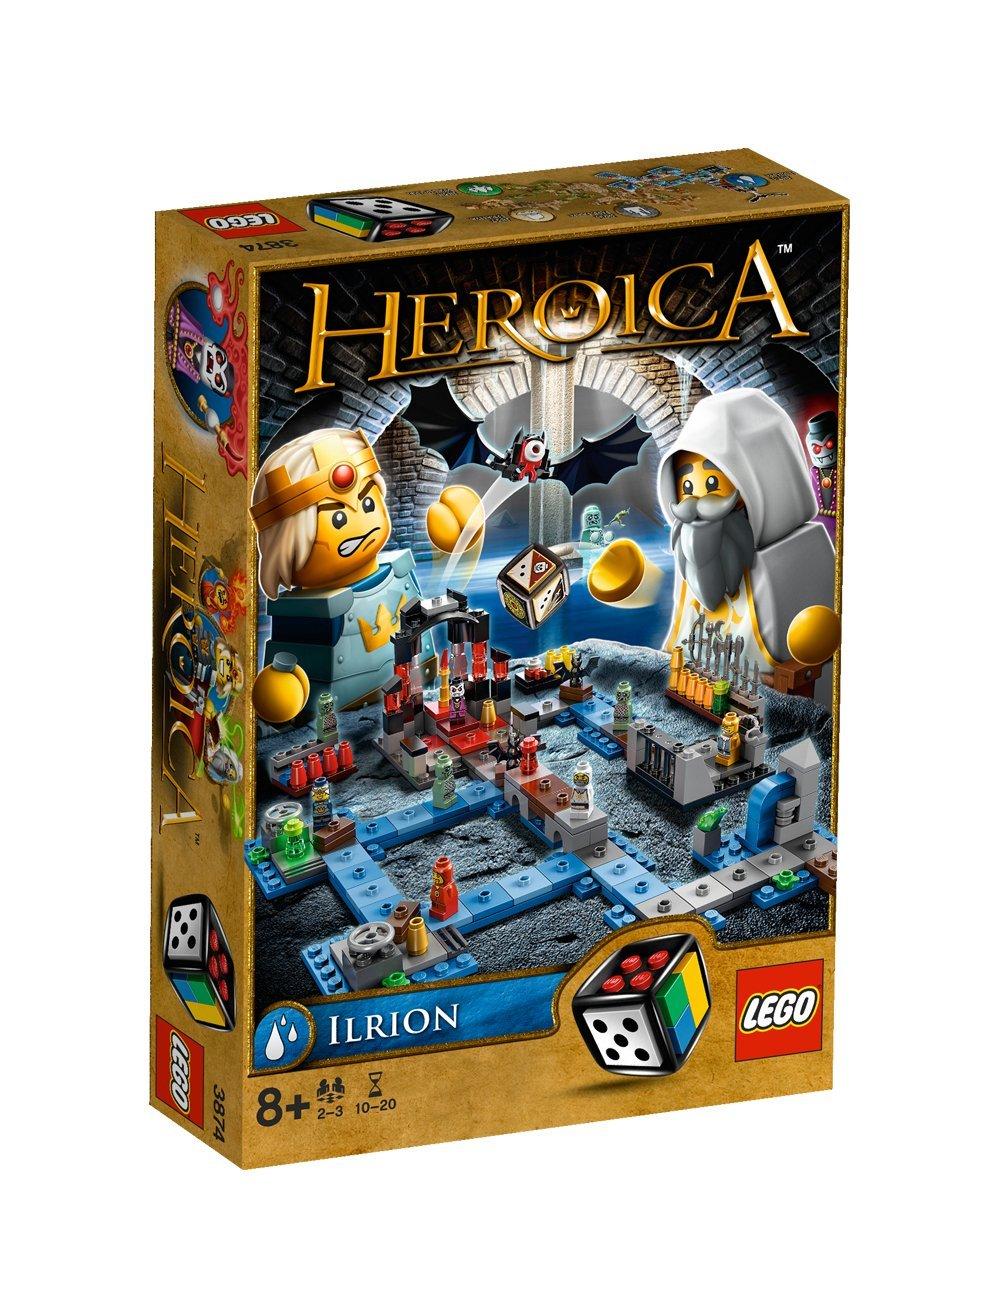 LEGO Heroica 3874 - - - Ilrion bbdc47